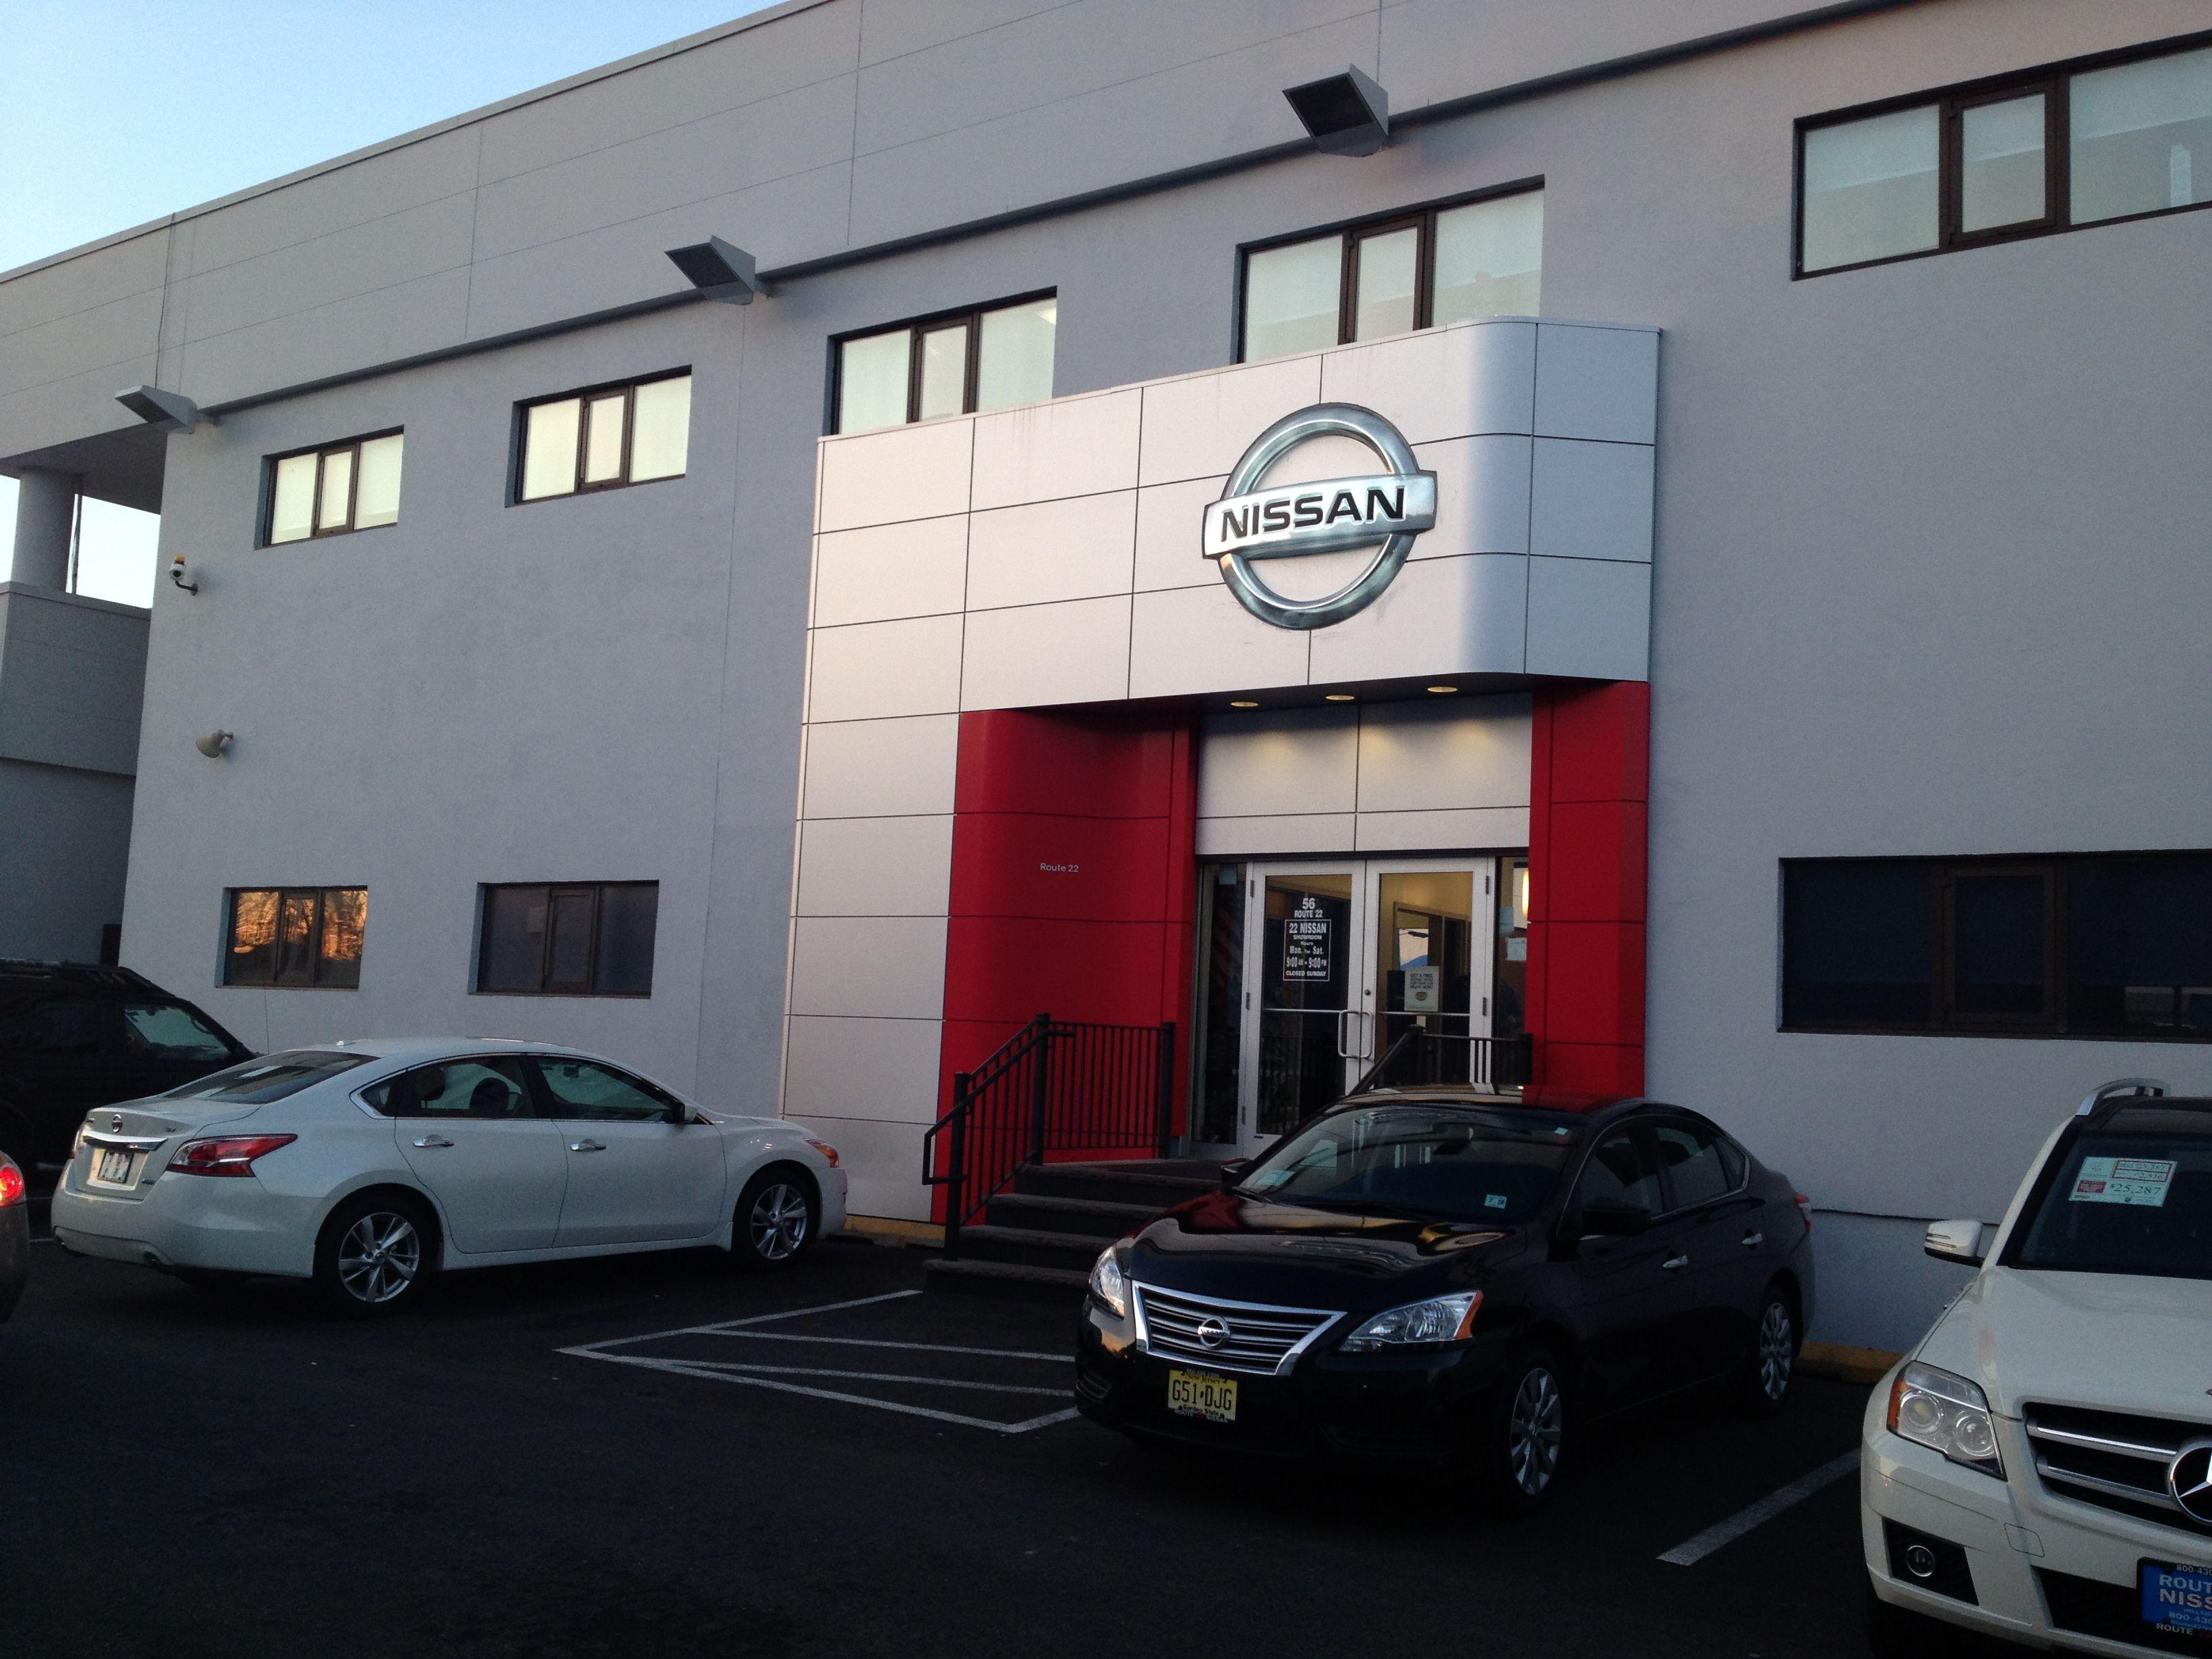 Route 22 Nissan >> Route 22 Nissan Route22nissan On Pinterest